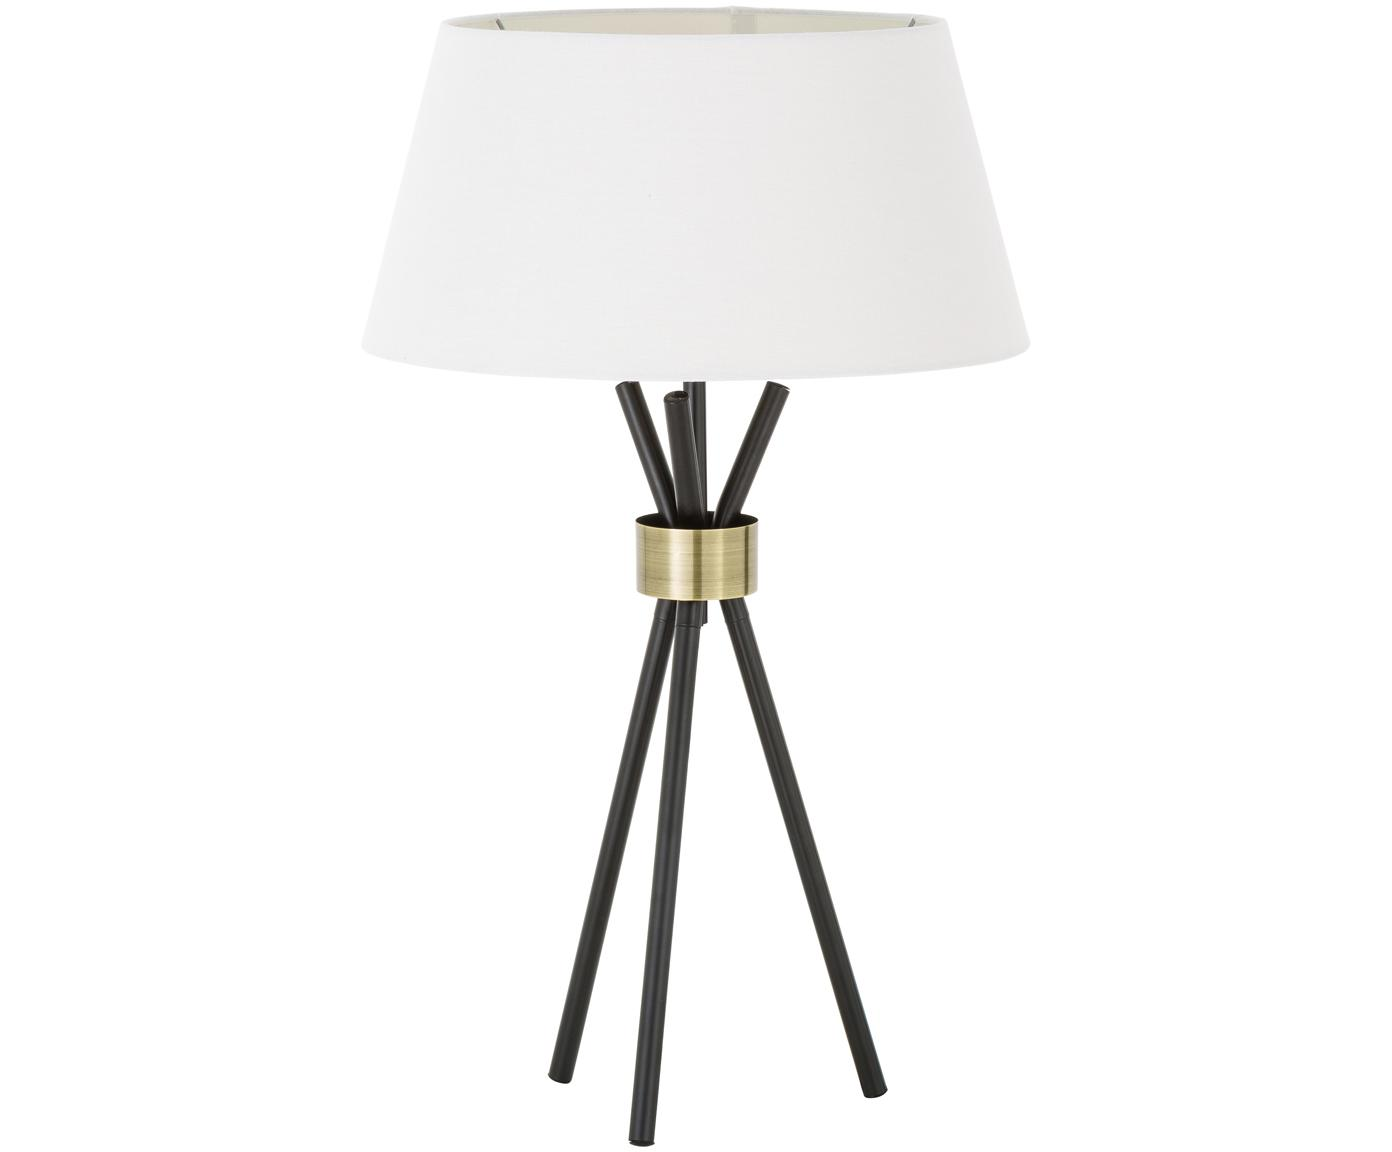 Grote tafellamp Tribeca, Lampenkap: linnen, Lampvoet: gelakt metaal, Wit, zwart, Ø 40 cm